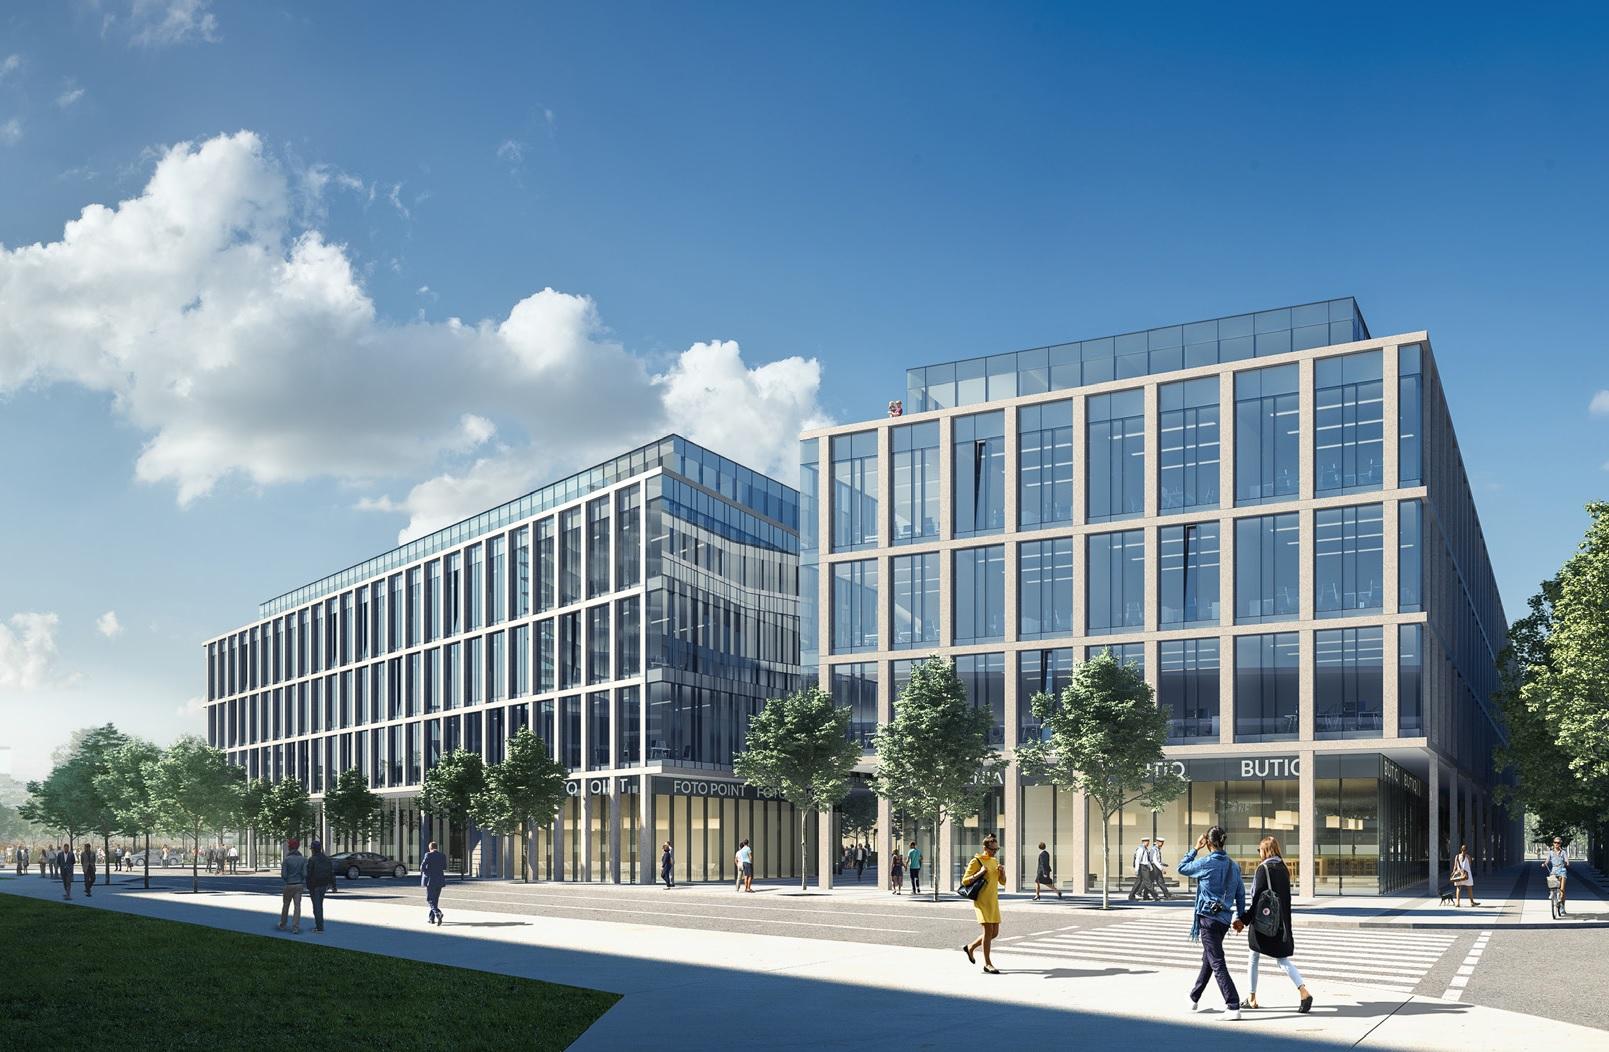 Wizualizacja obiektu Marina Office, fot. www.phnsa.pl